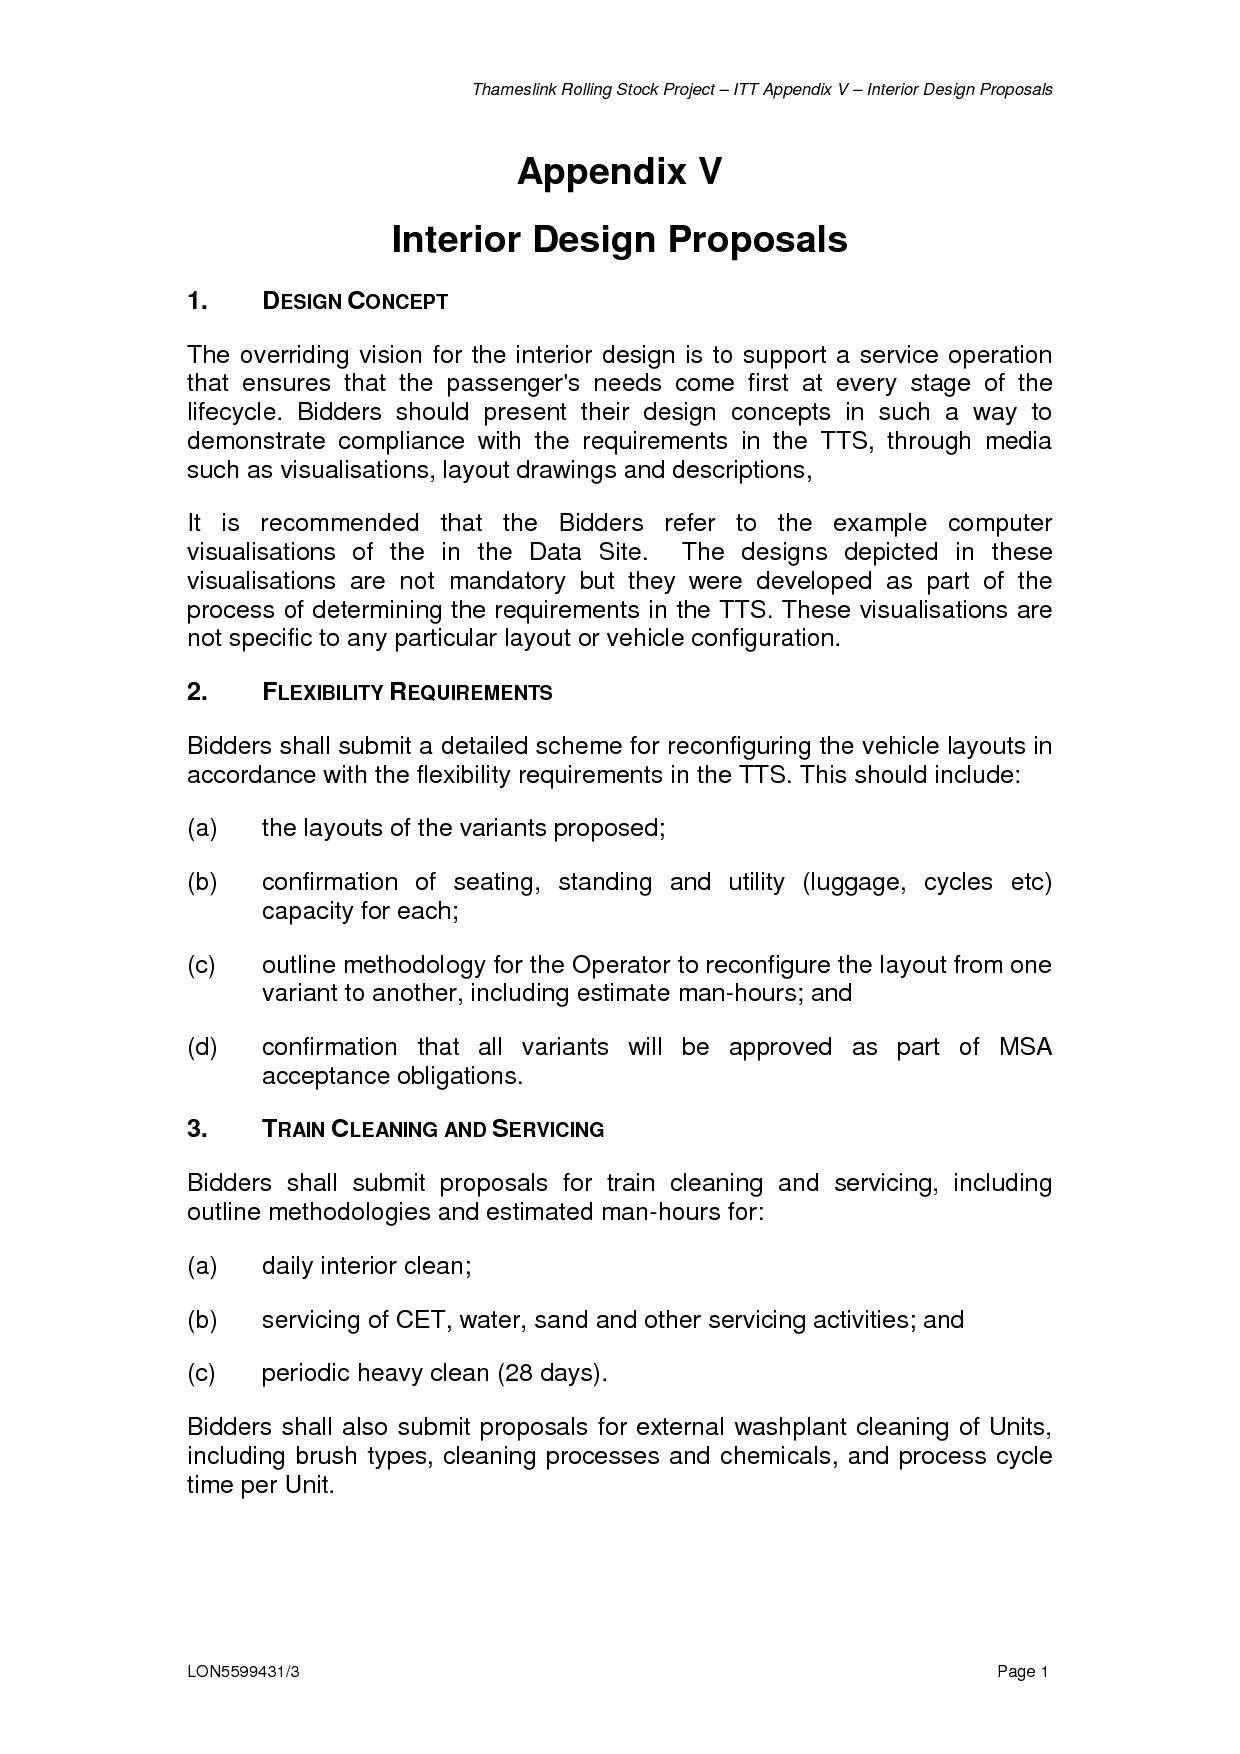 sample proposal interior design